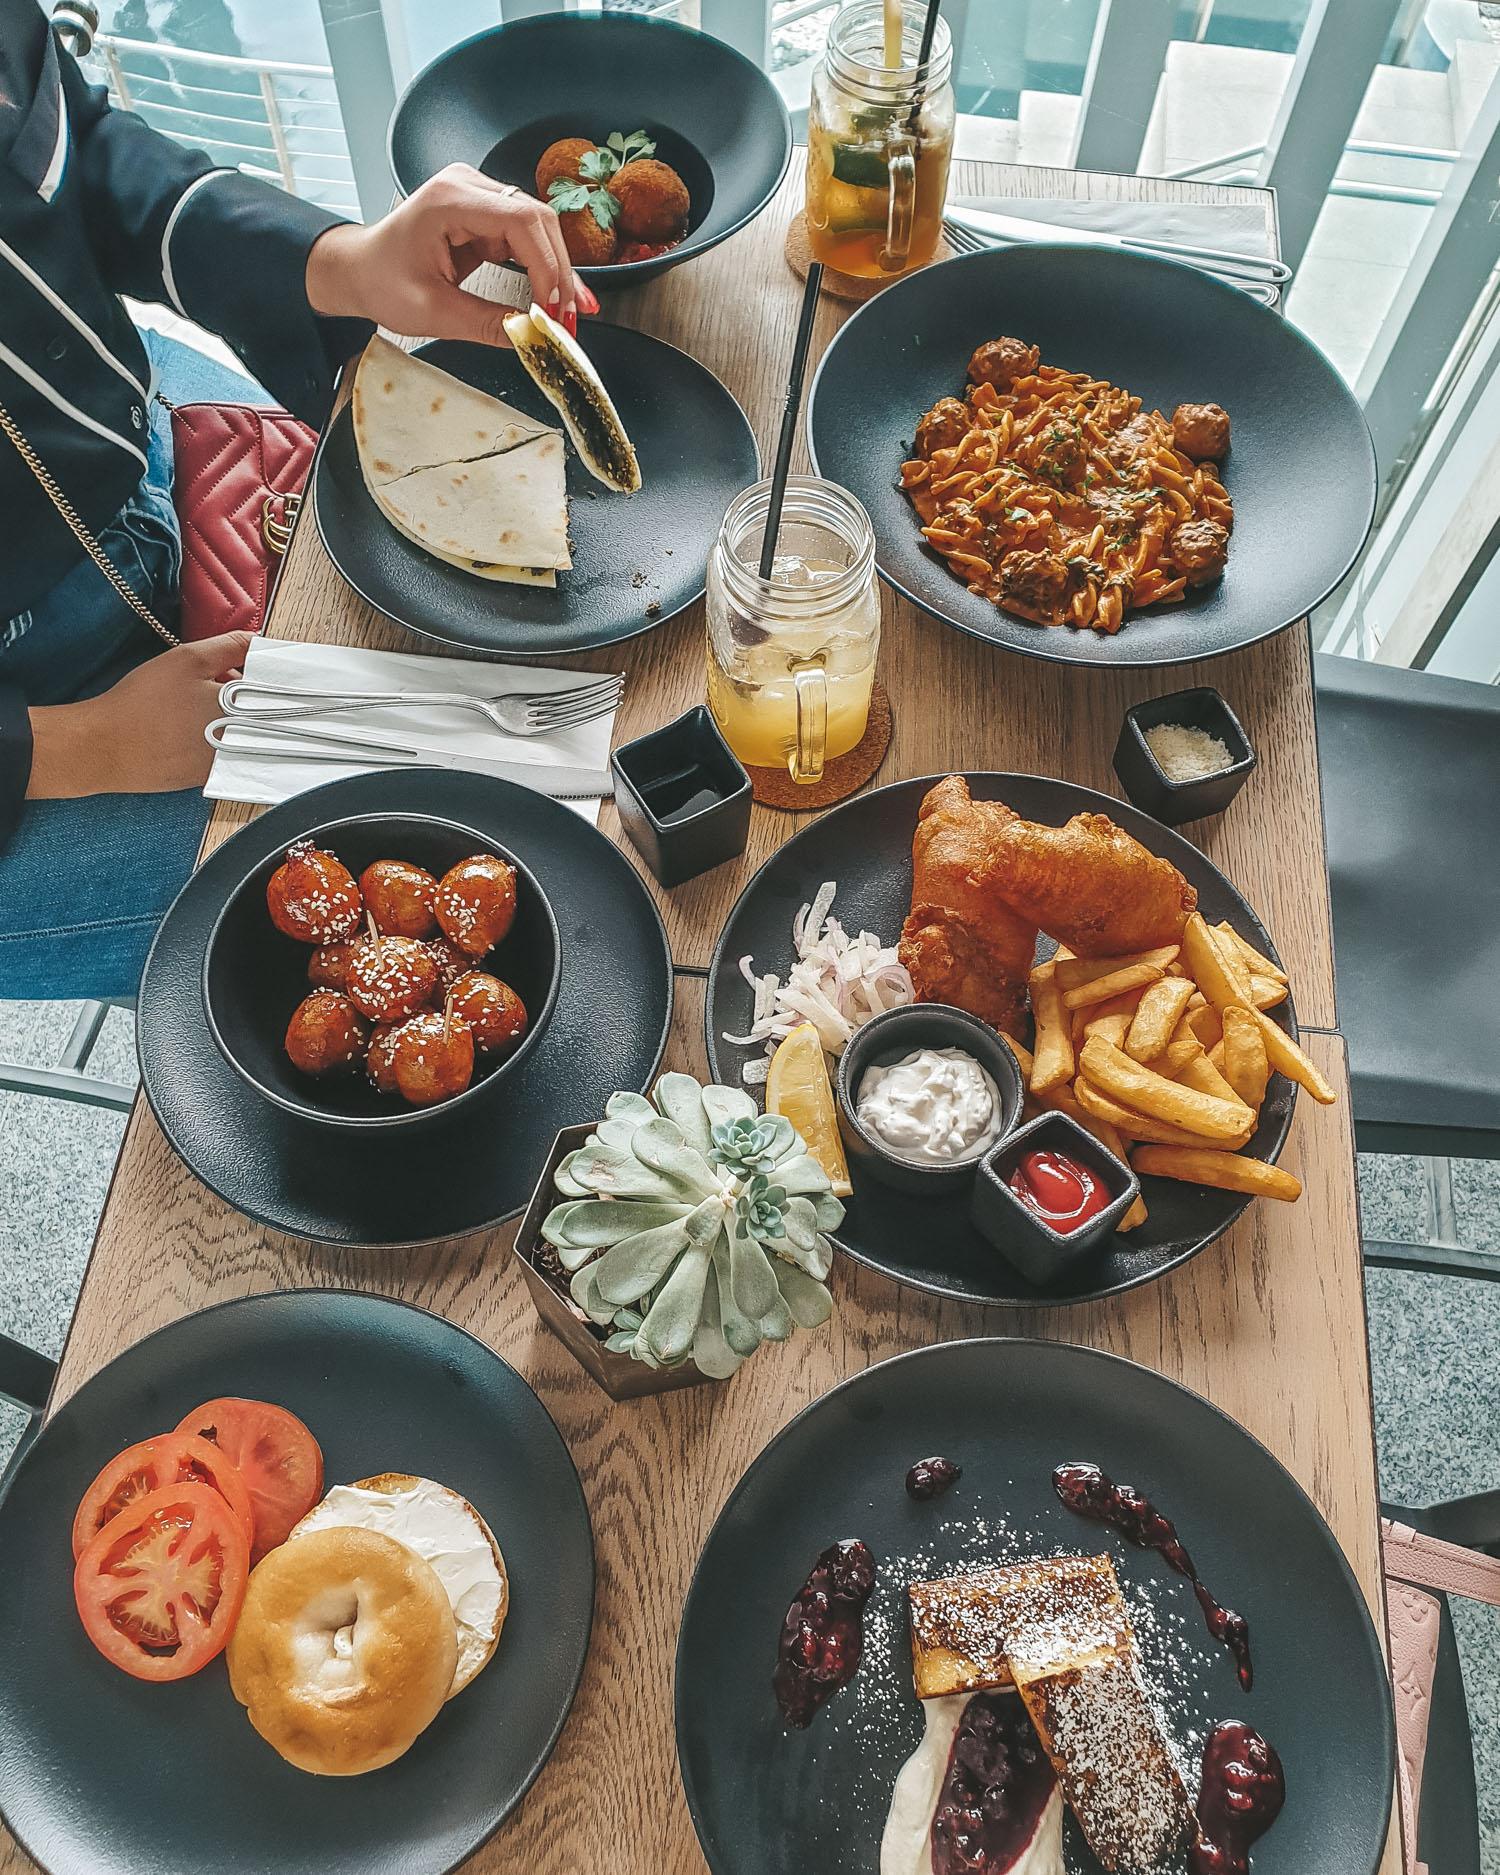 Tawa Bakery gluten free lunch in Abu Dhabi